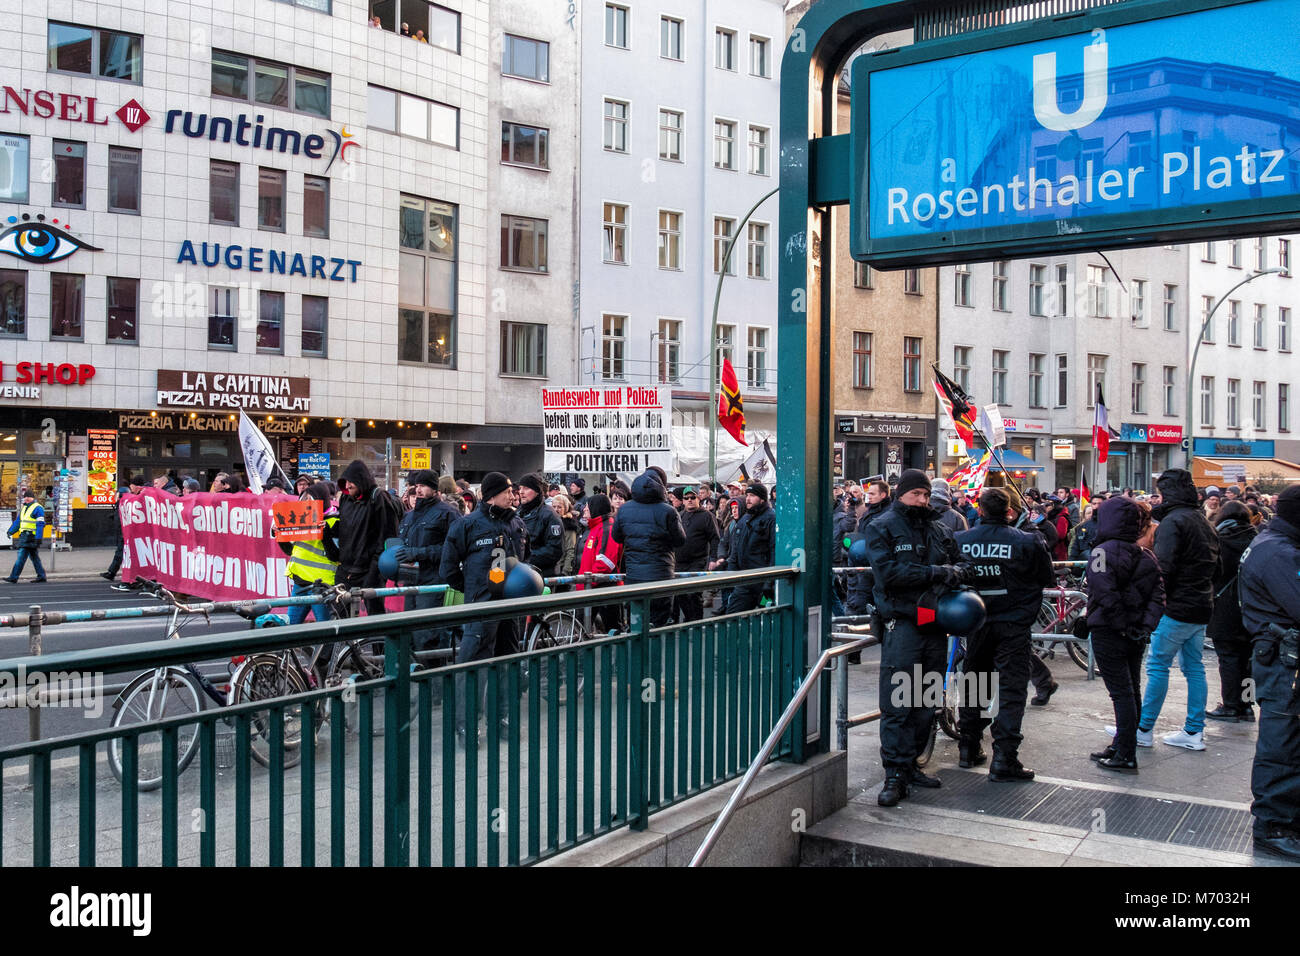 Berlin-Mitte,Rosenthalerplatz.Far  Right demonstration march in city street - Stock Image